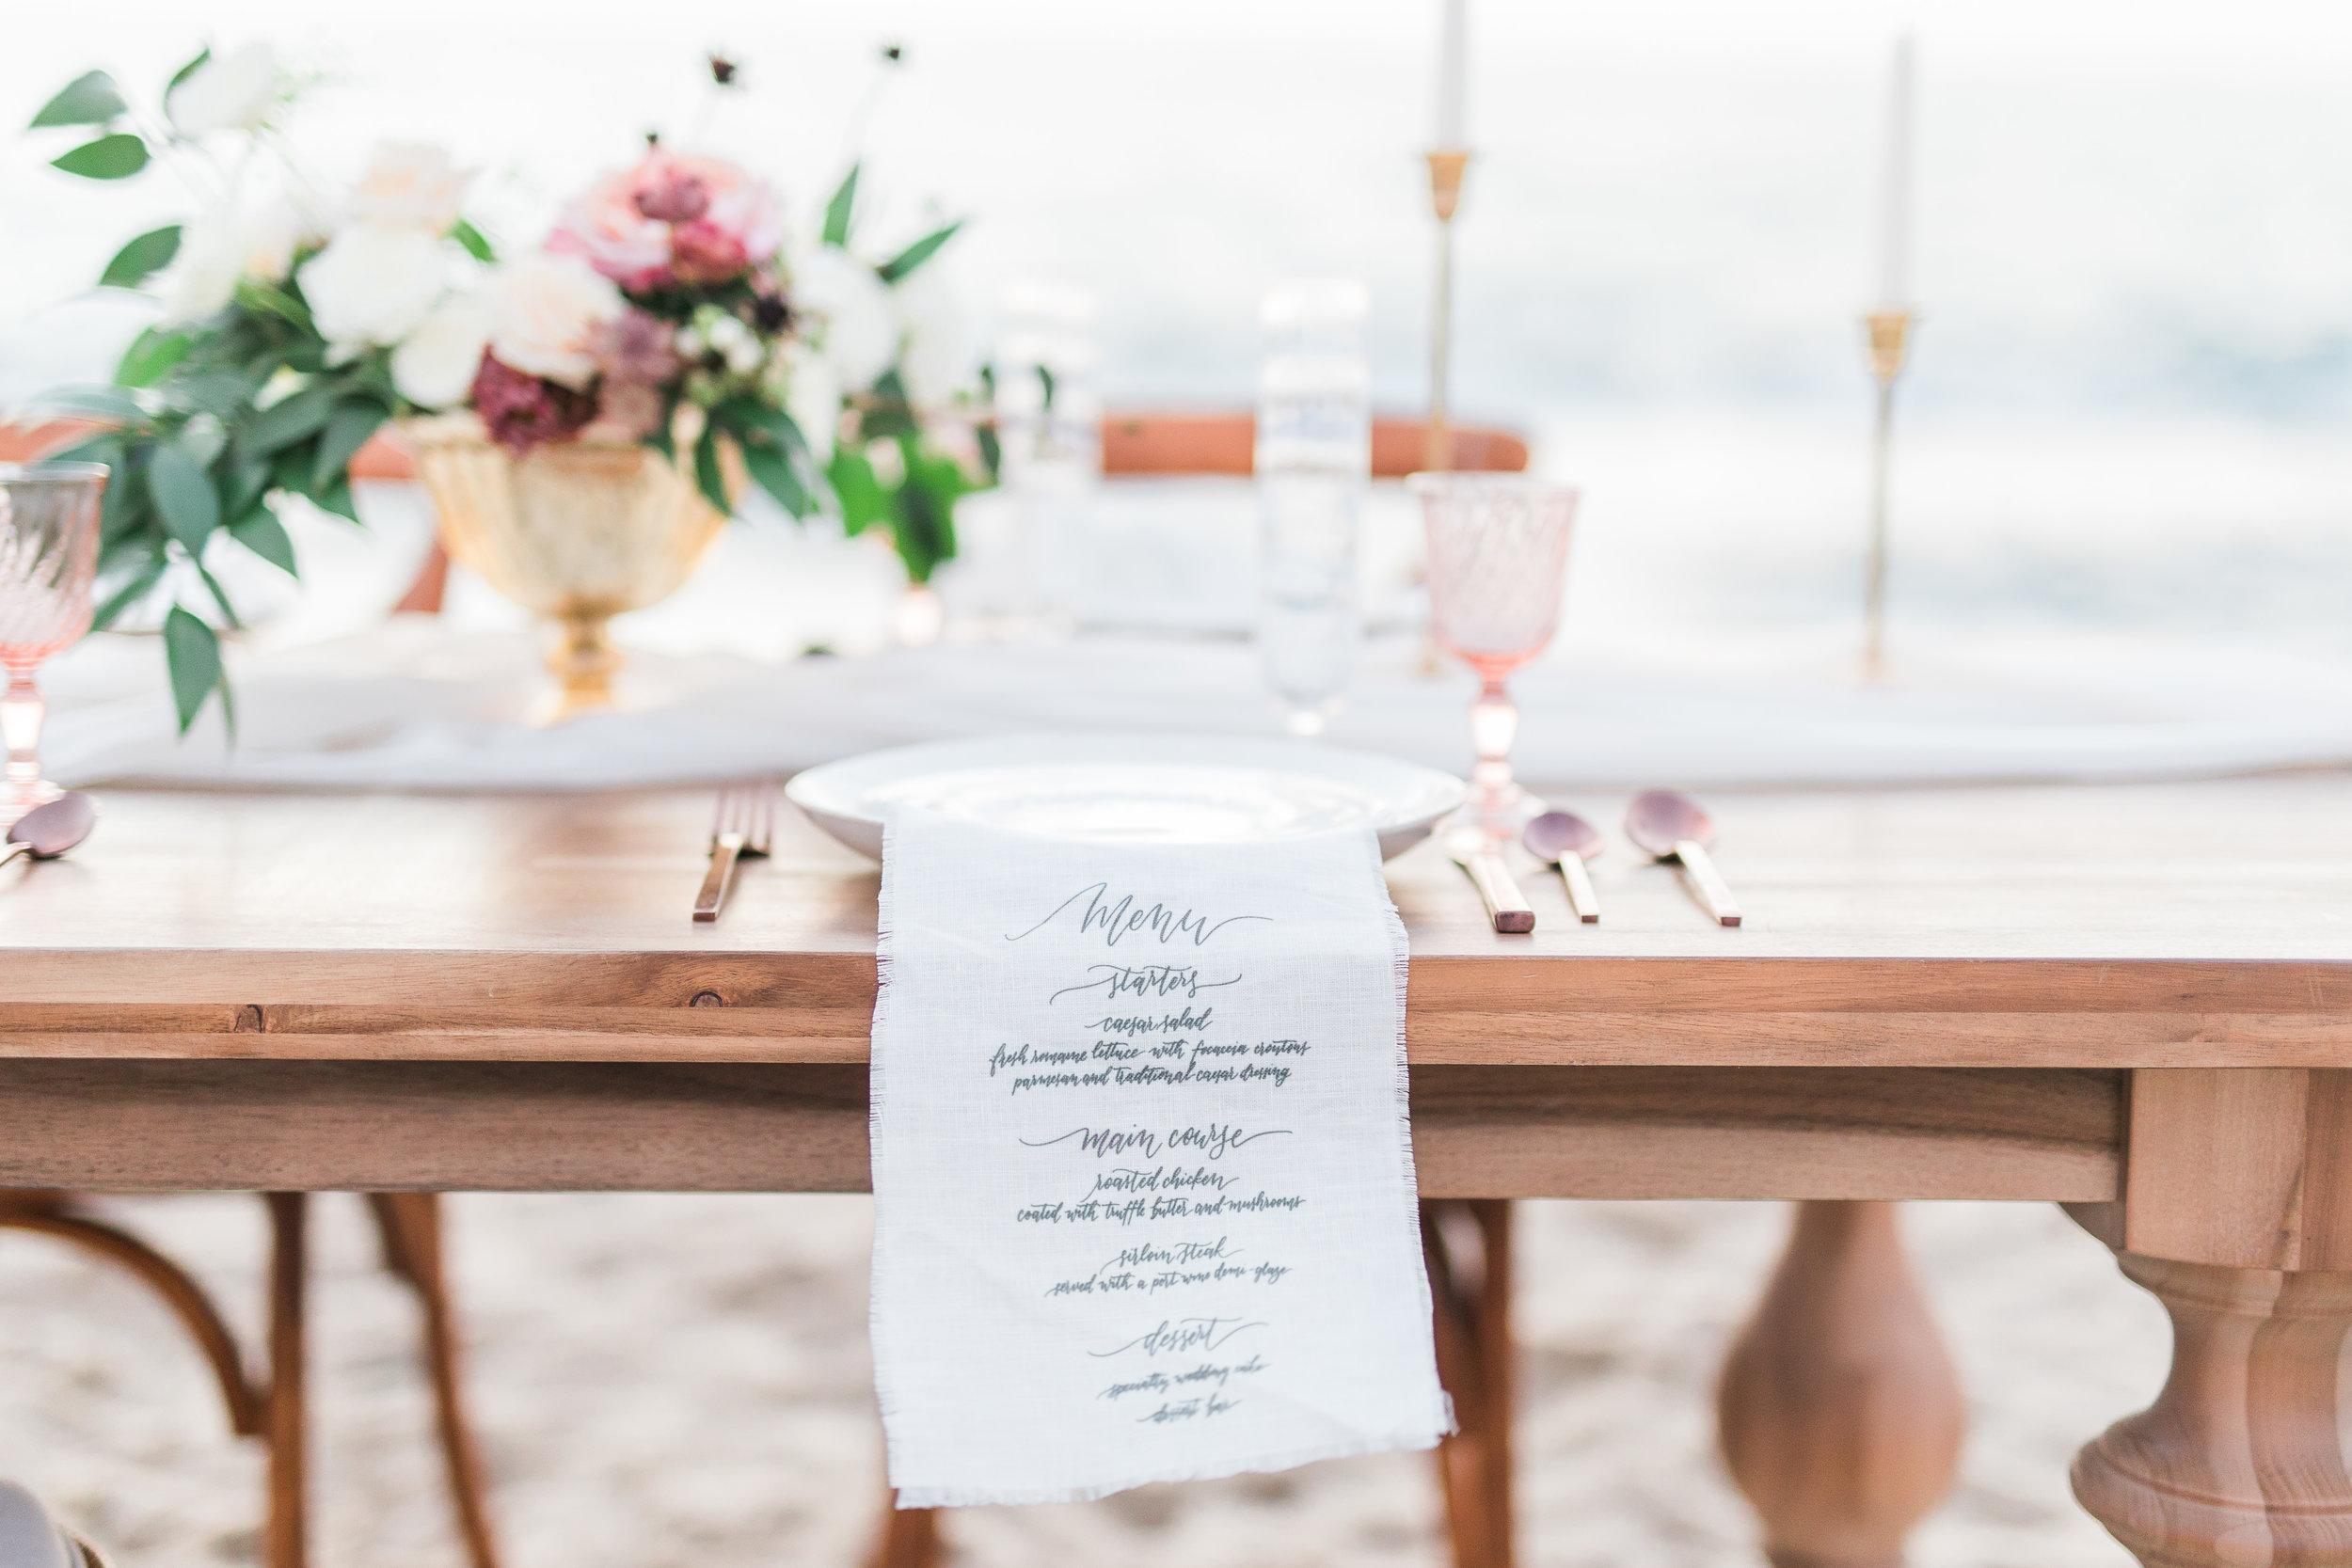 LA-Wedding-Shoot-by-JBJ-Pictures-298.jpg